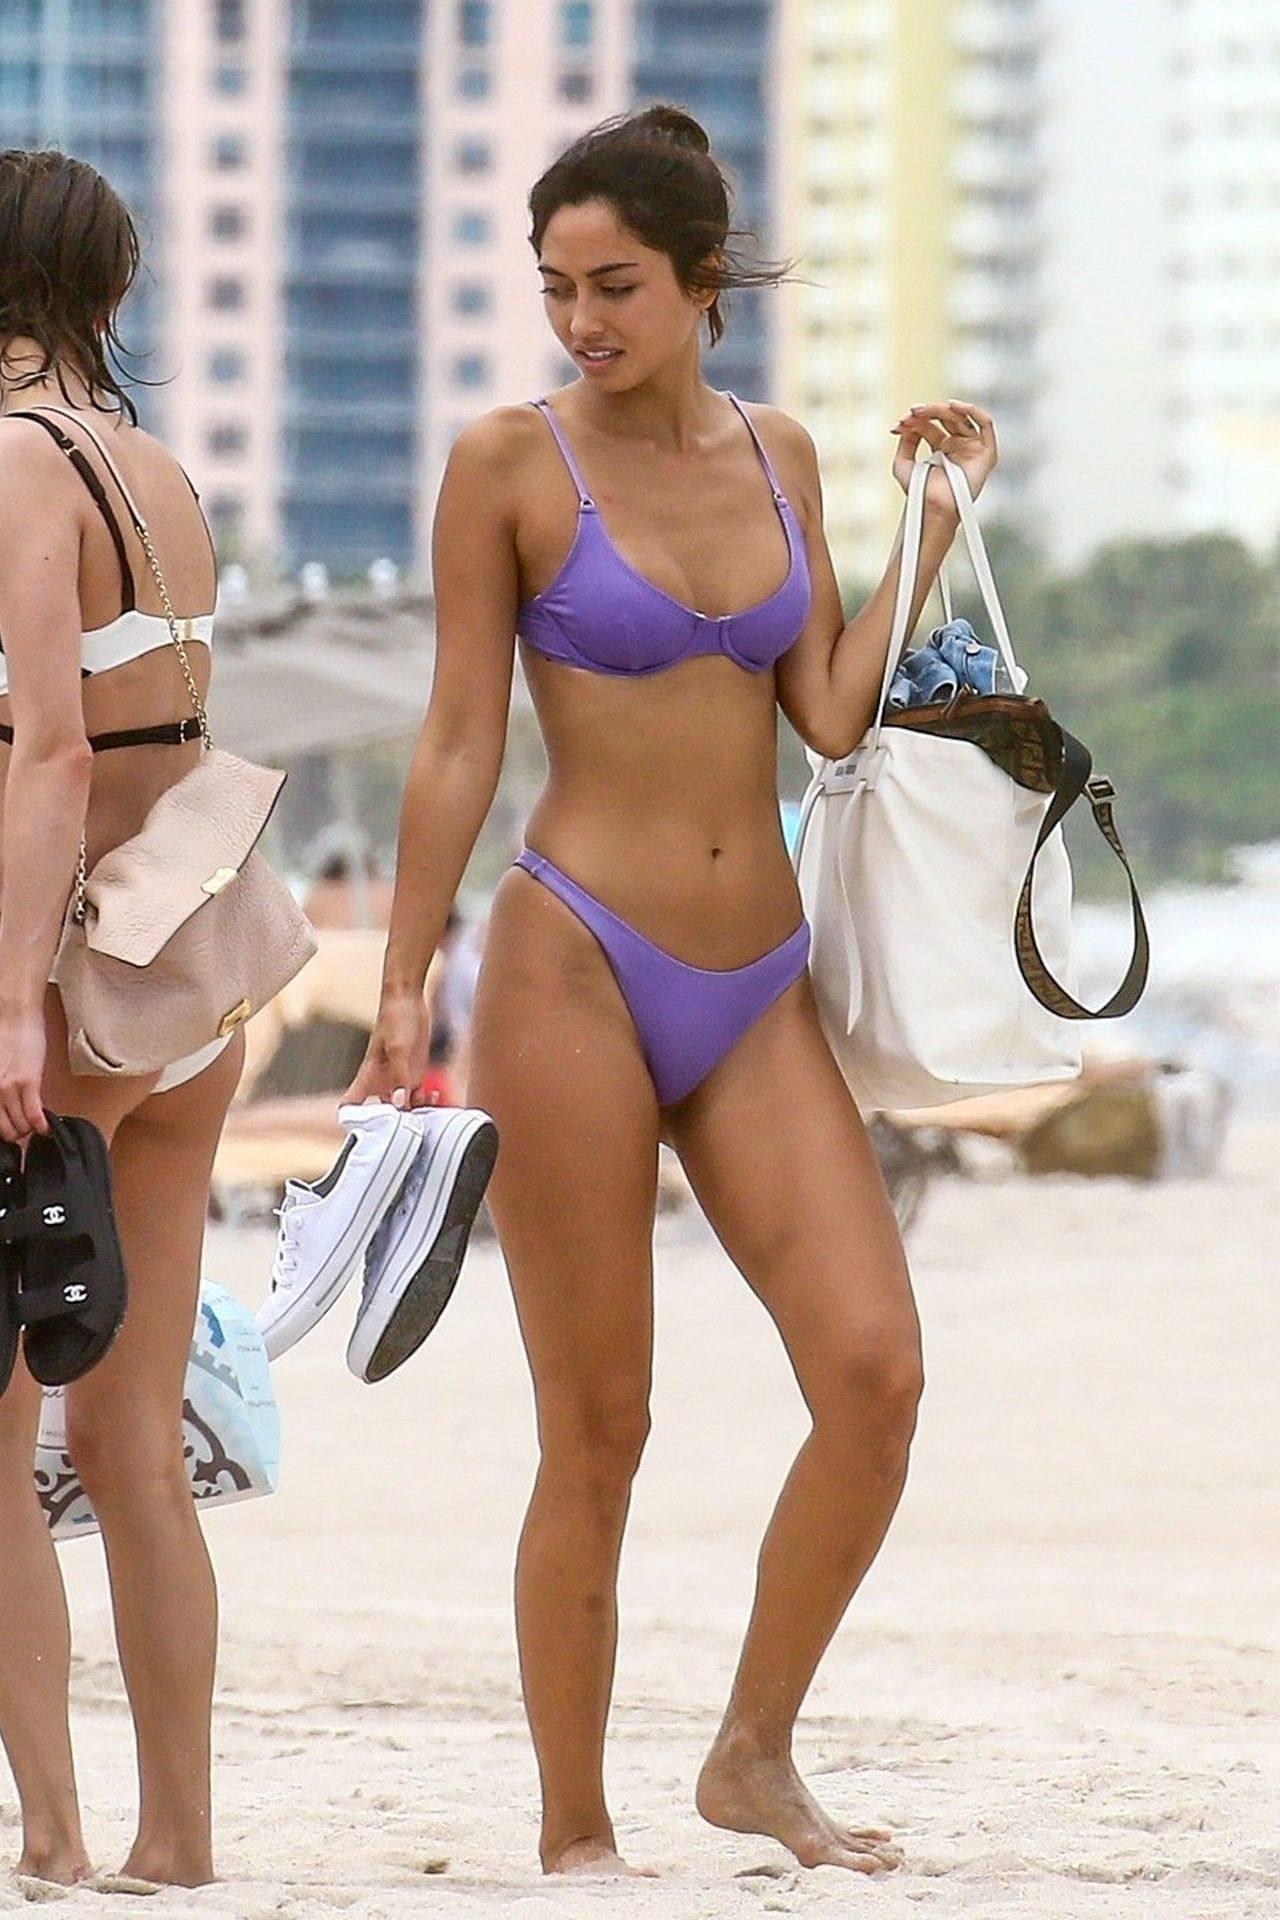 Ambra Gutierrez – Hot Body In Small Bikini On Beach In Miami Beach 0005